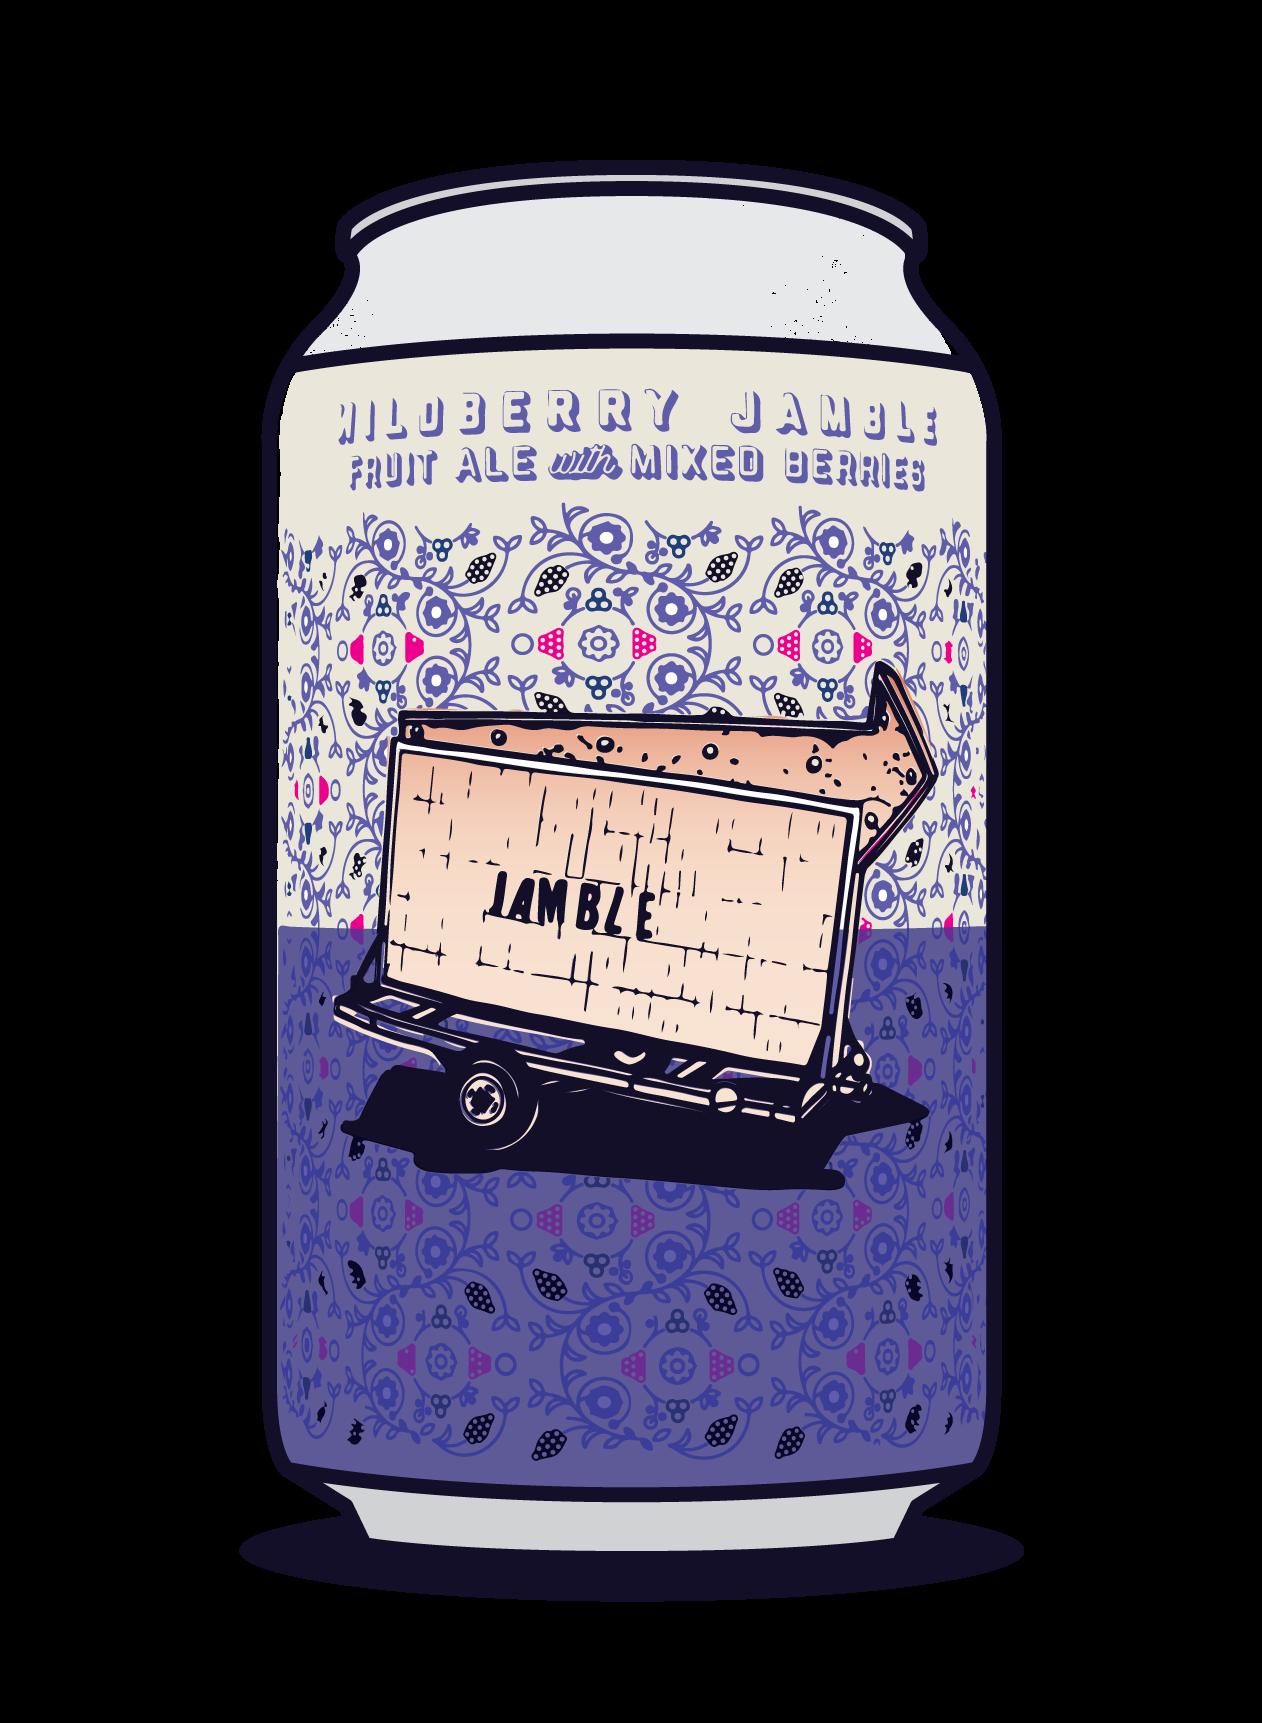 Wildberry Jamble Image